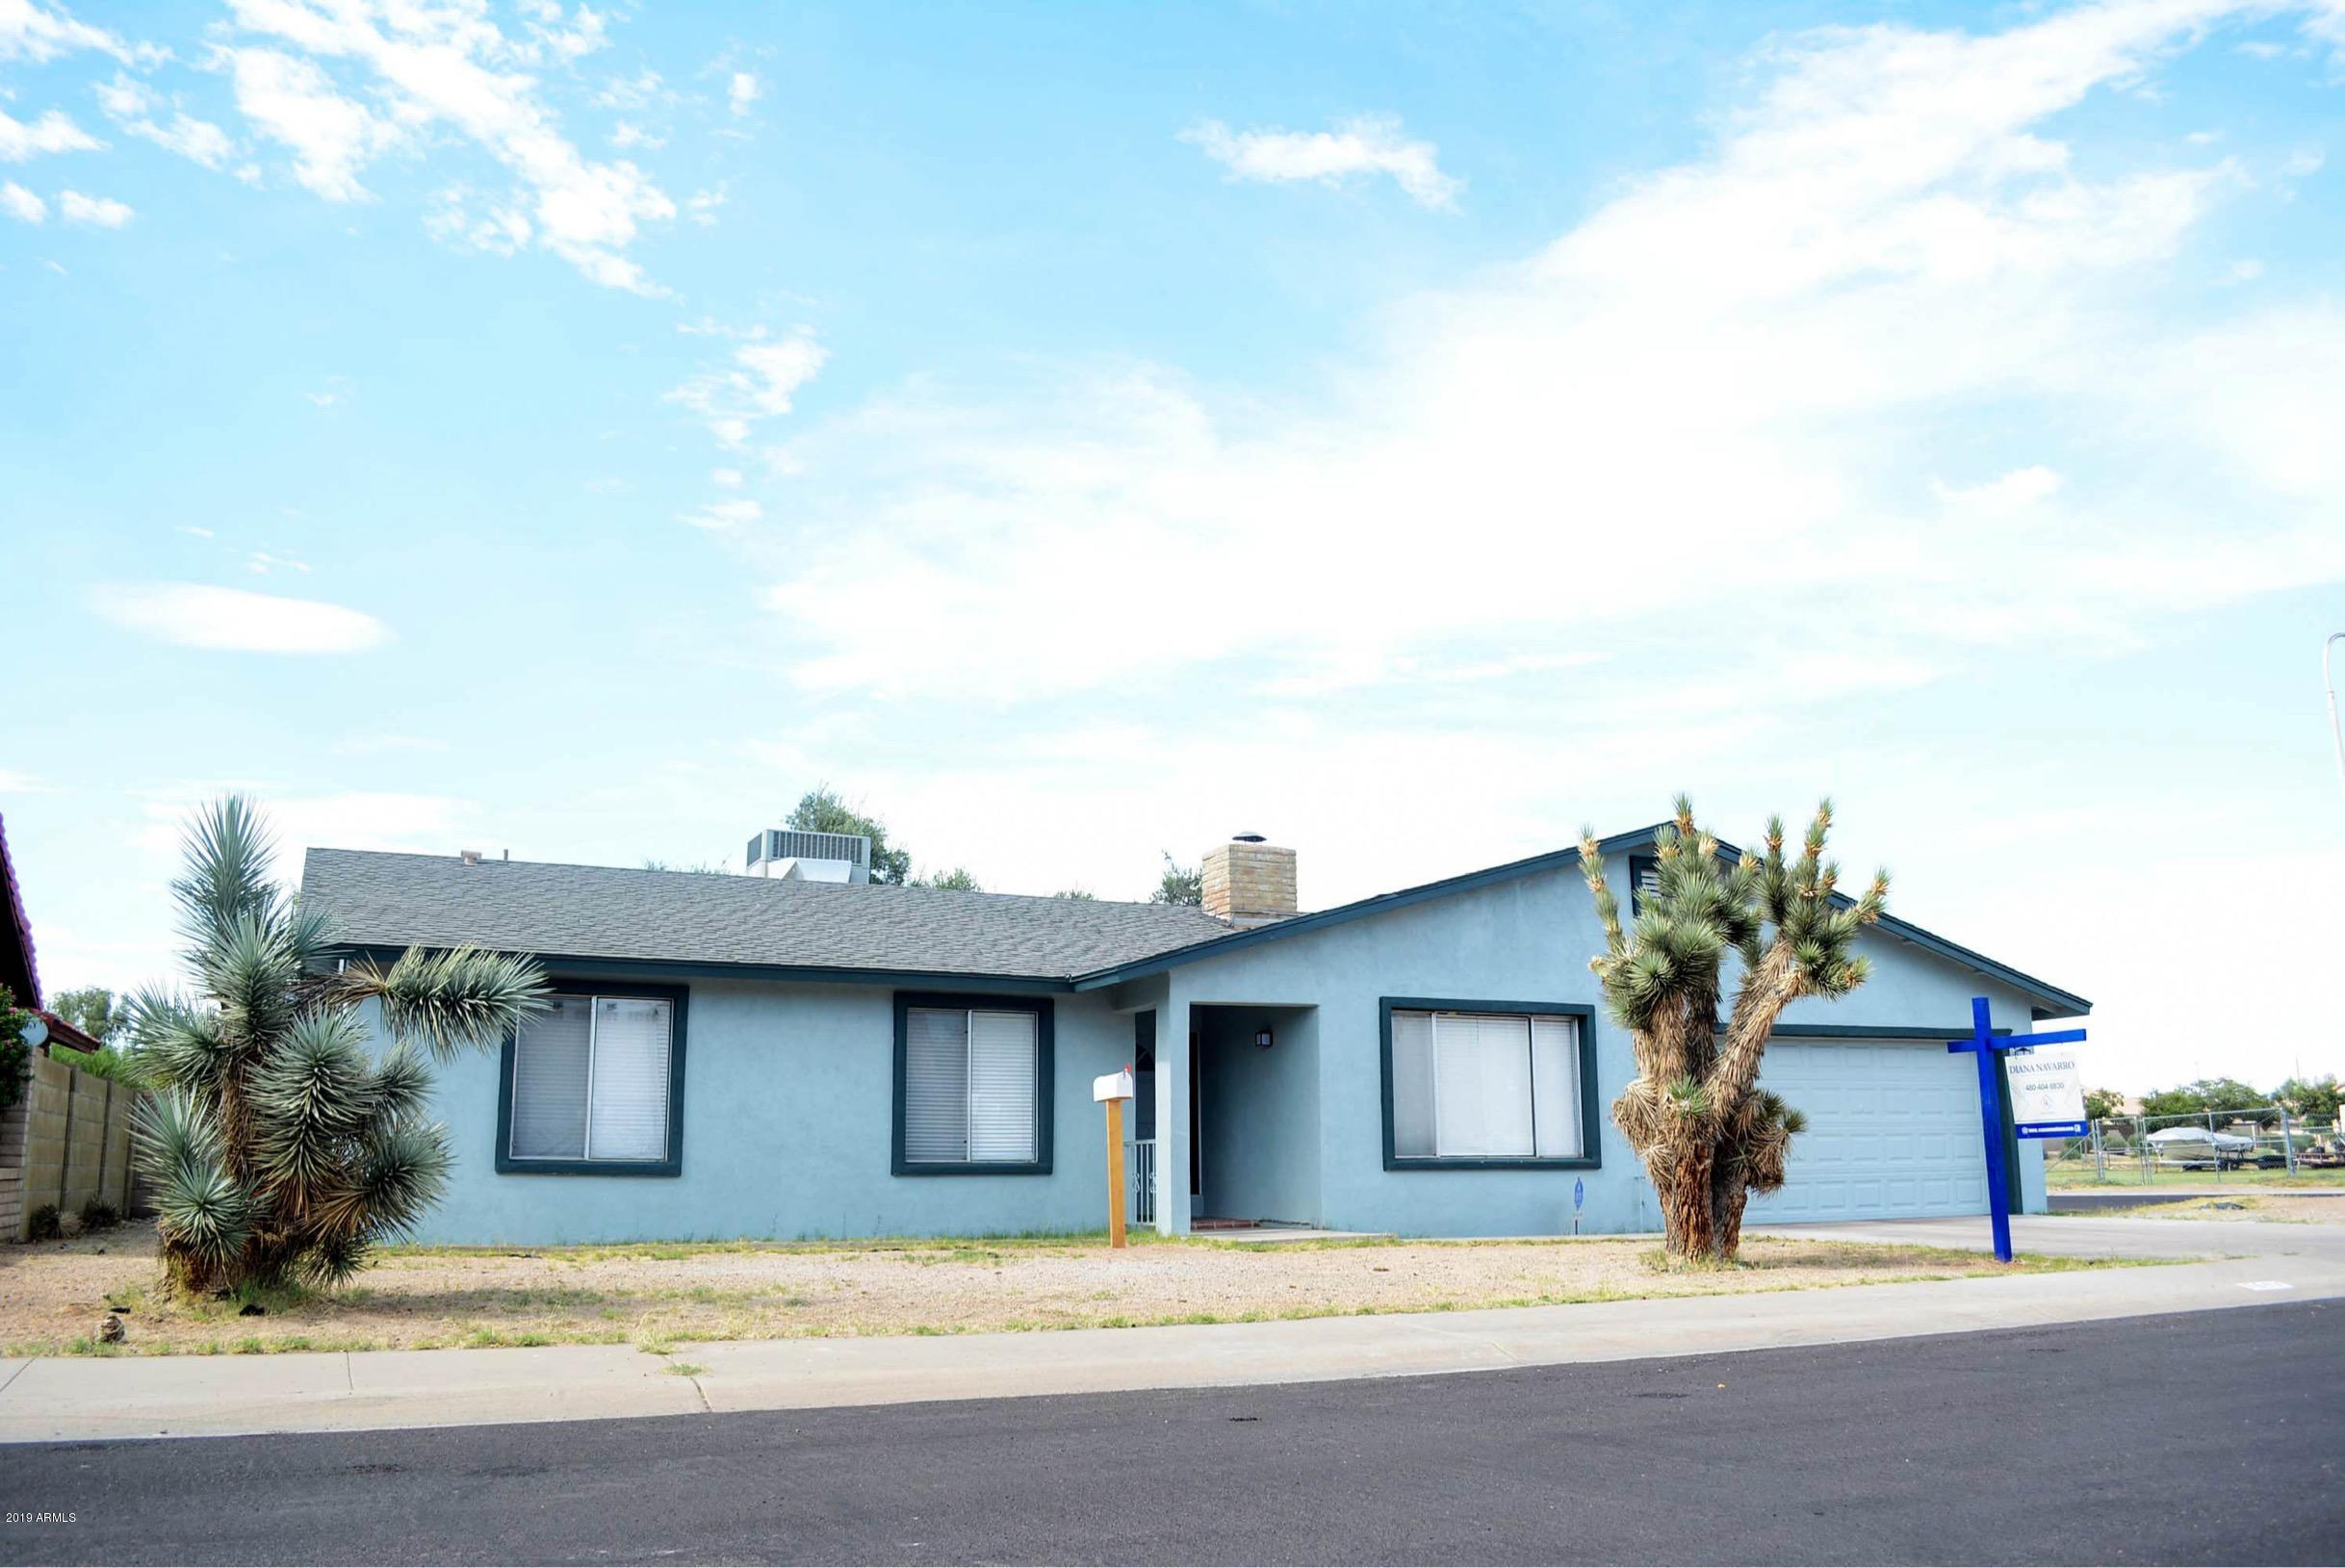 7642 W Palmaire Avenue, Glendale, Arizona